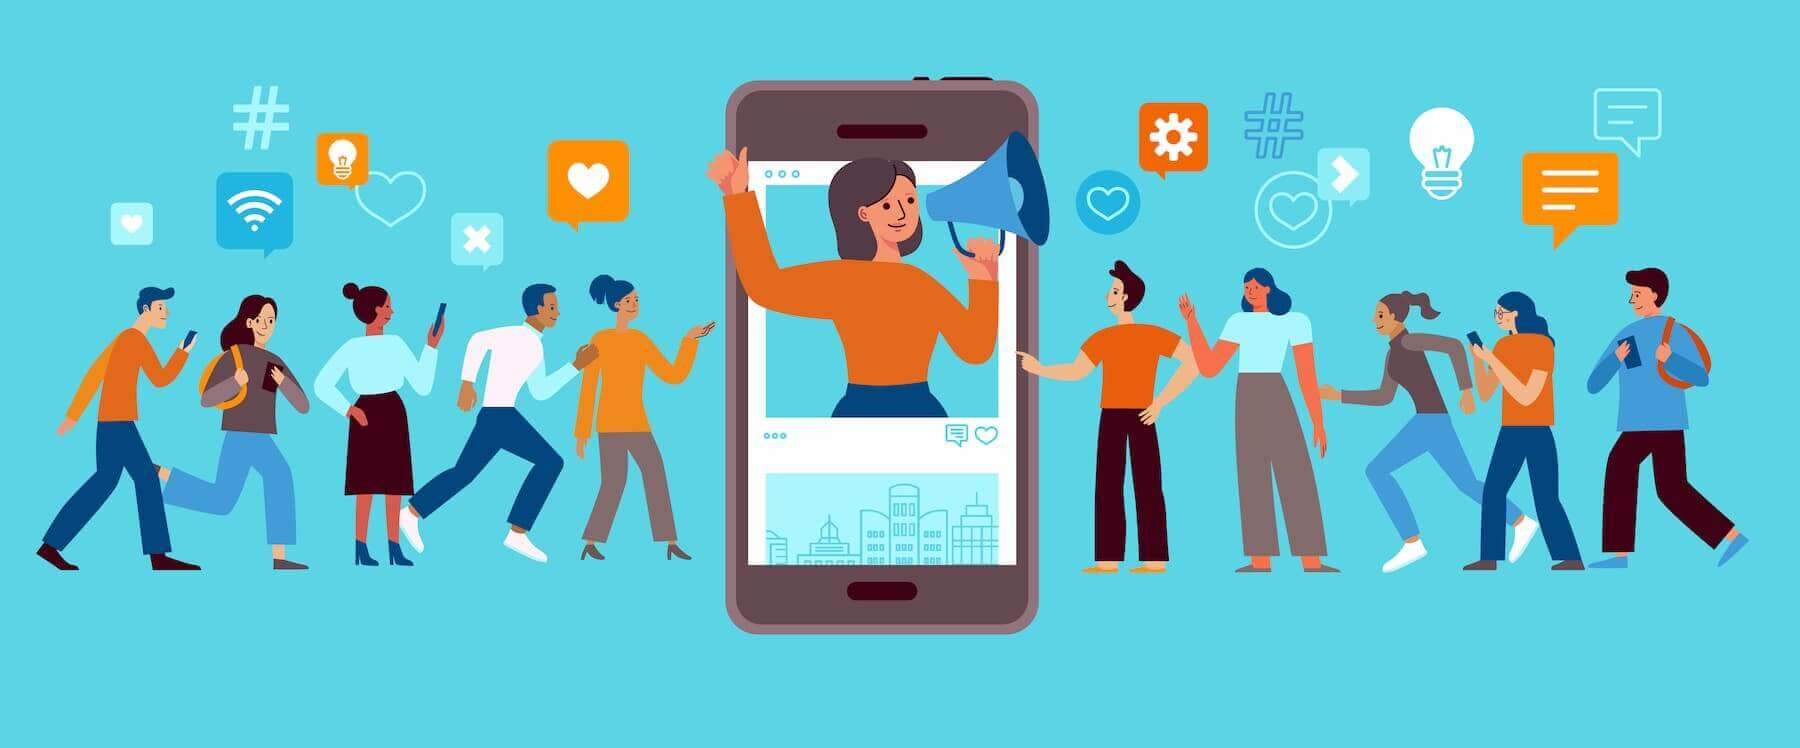 social media linkedin whatsapp newsoktober 2020